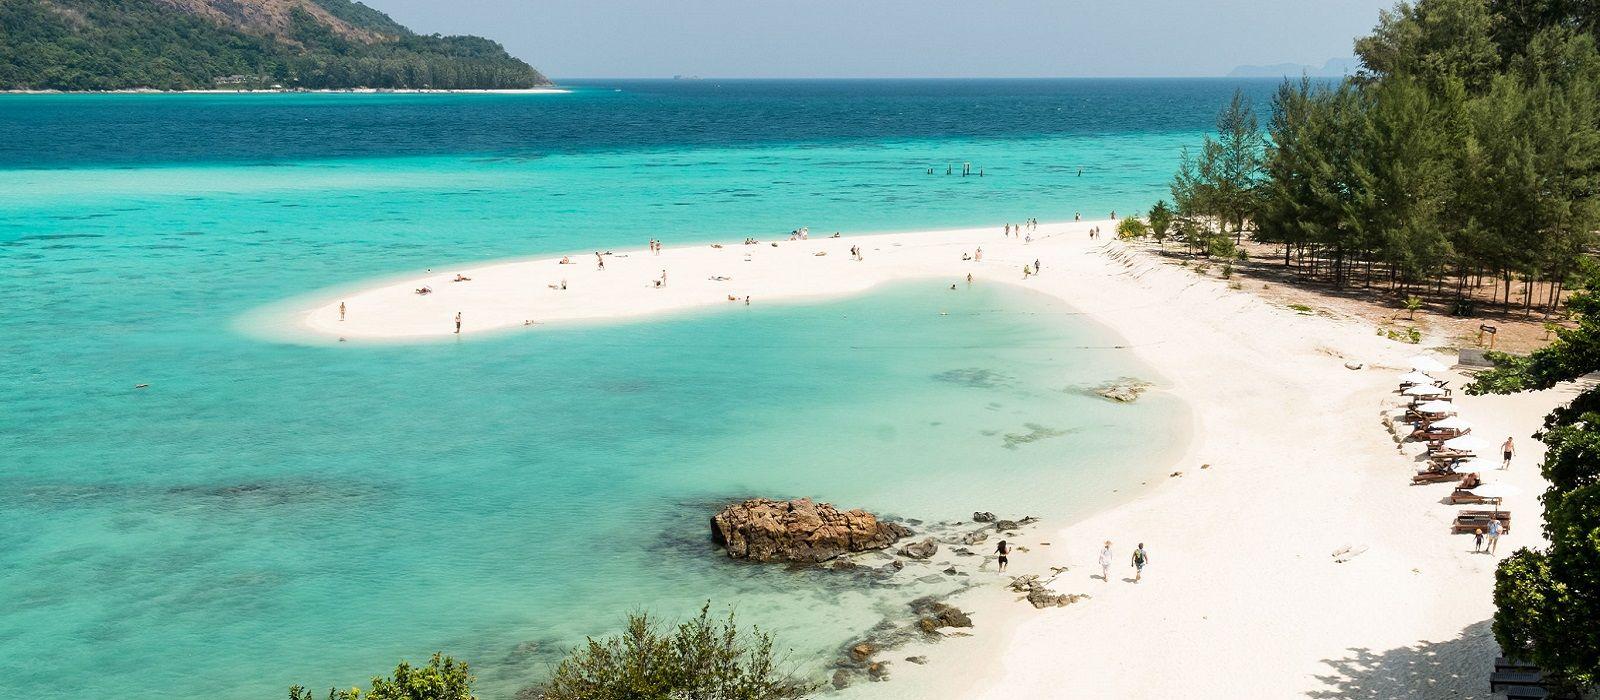 Thailand's Northern Heart and Koh Samui Beach Tour Trip 5